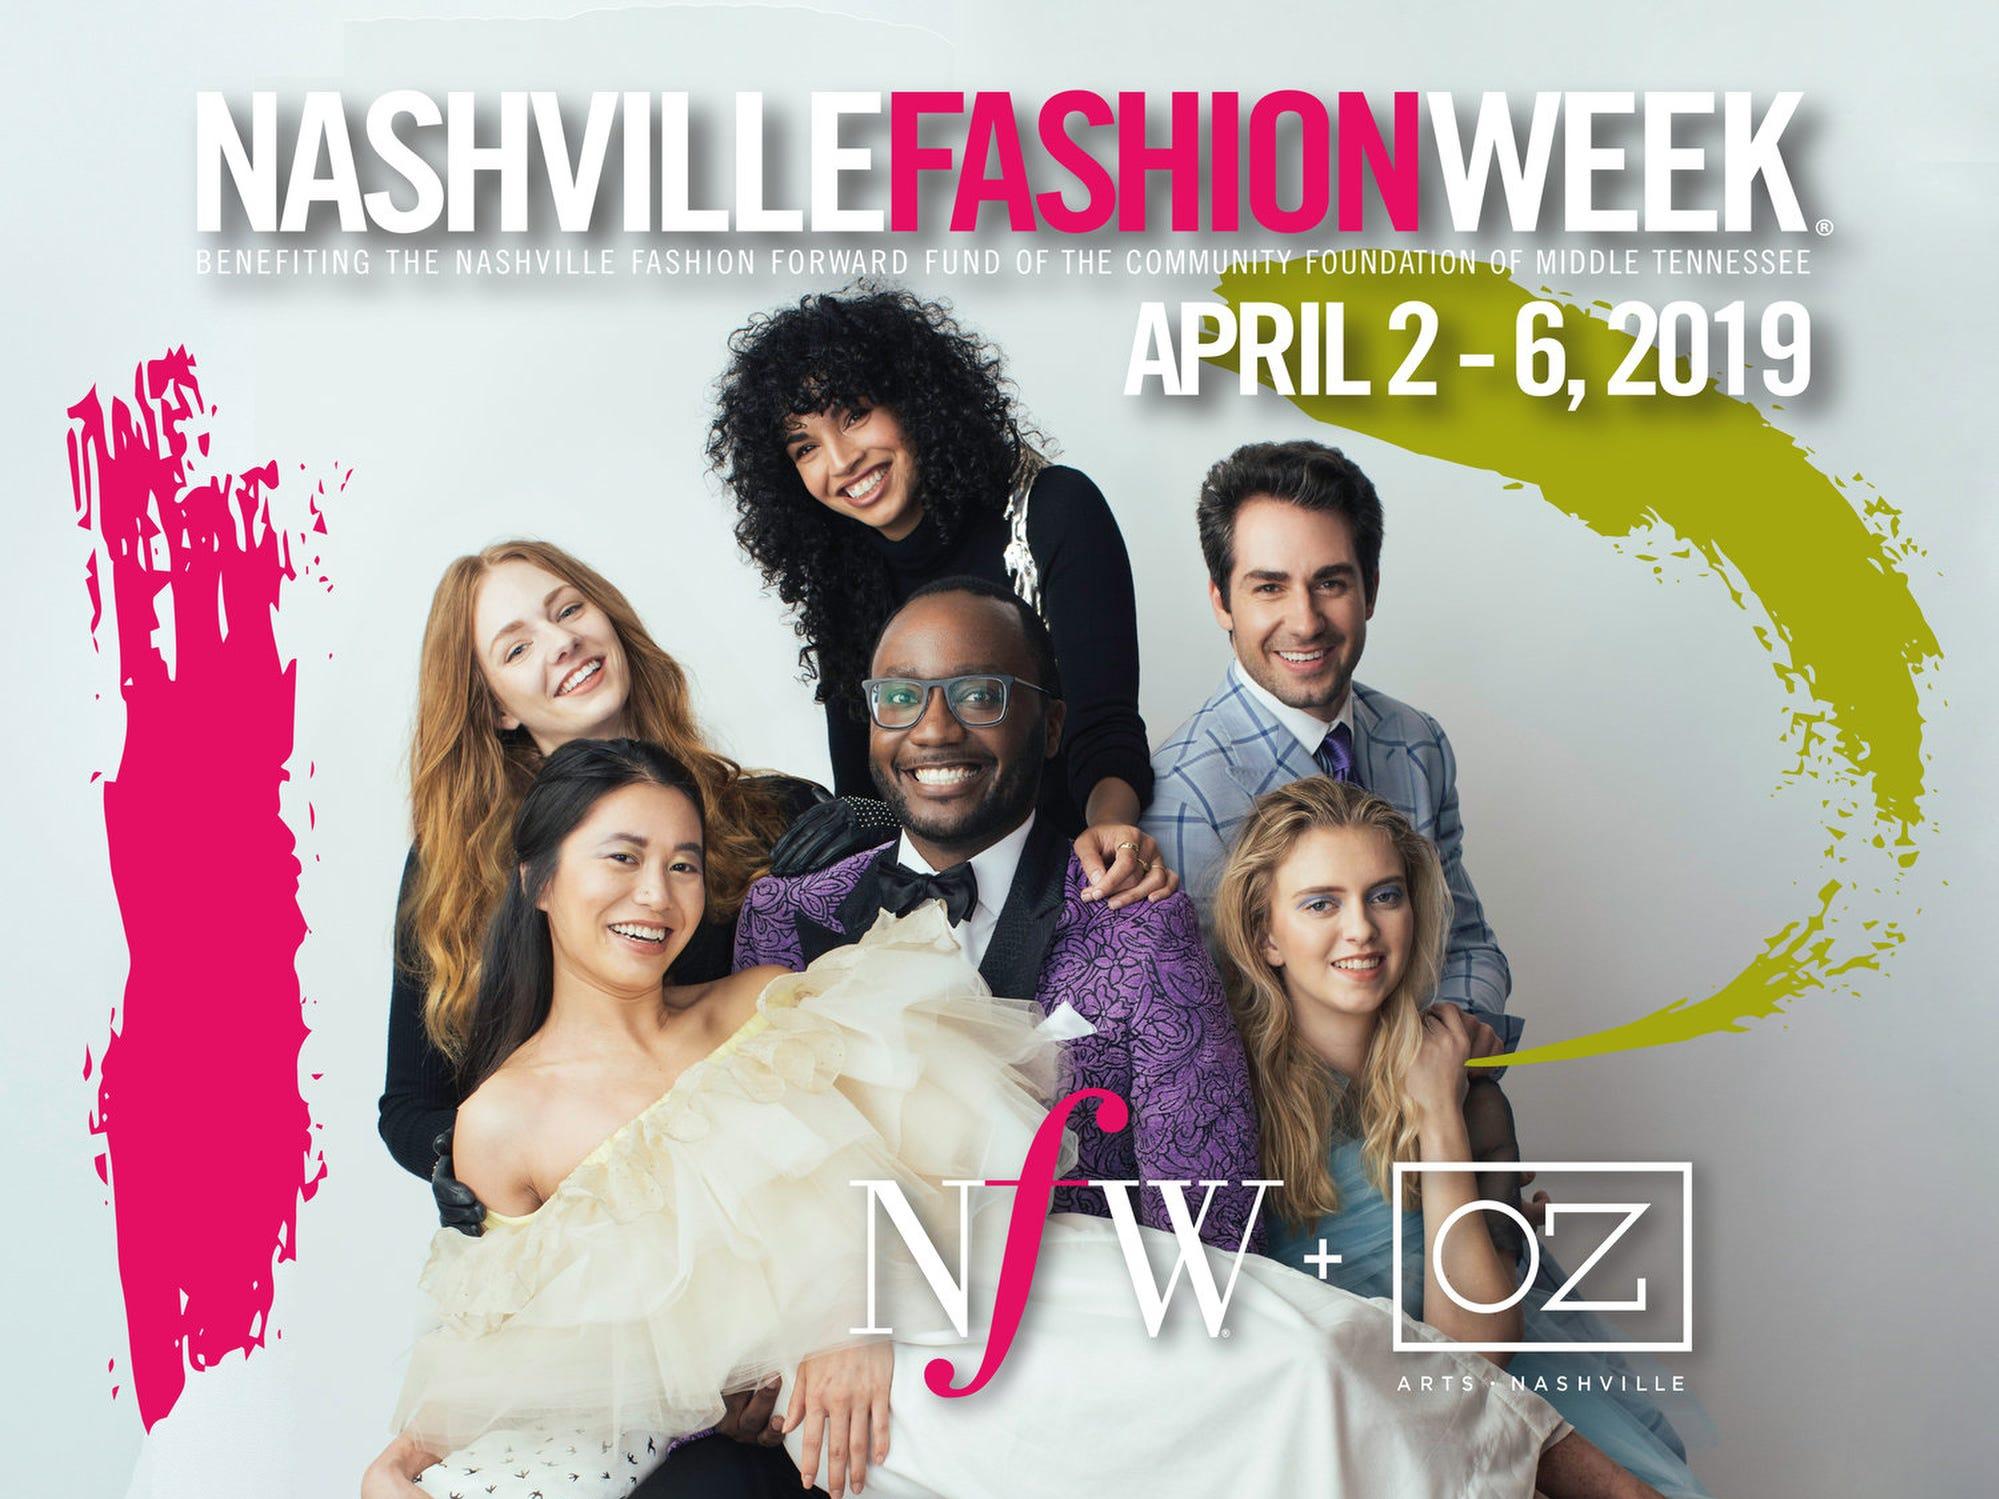 April 2NASHVILLE FASHION WEEK: Various events and venues in Nashville through April 6, nashvillefashionweek.com